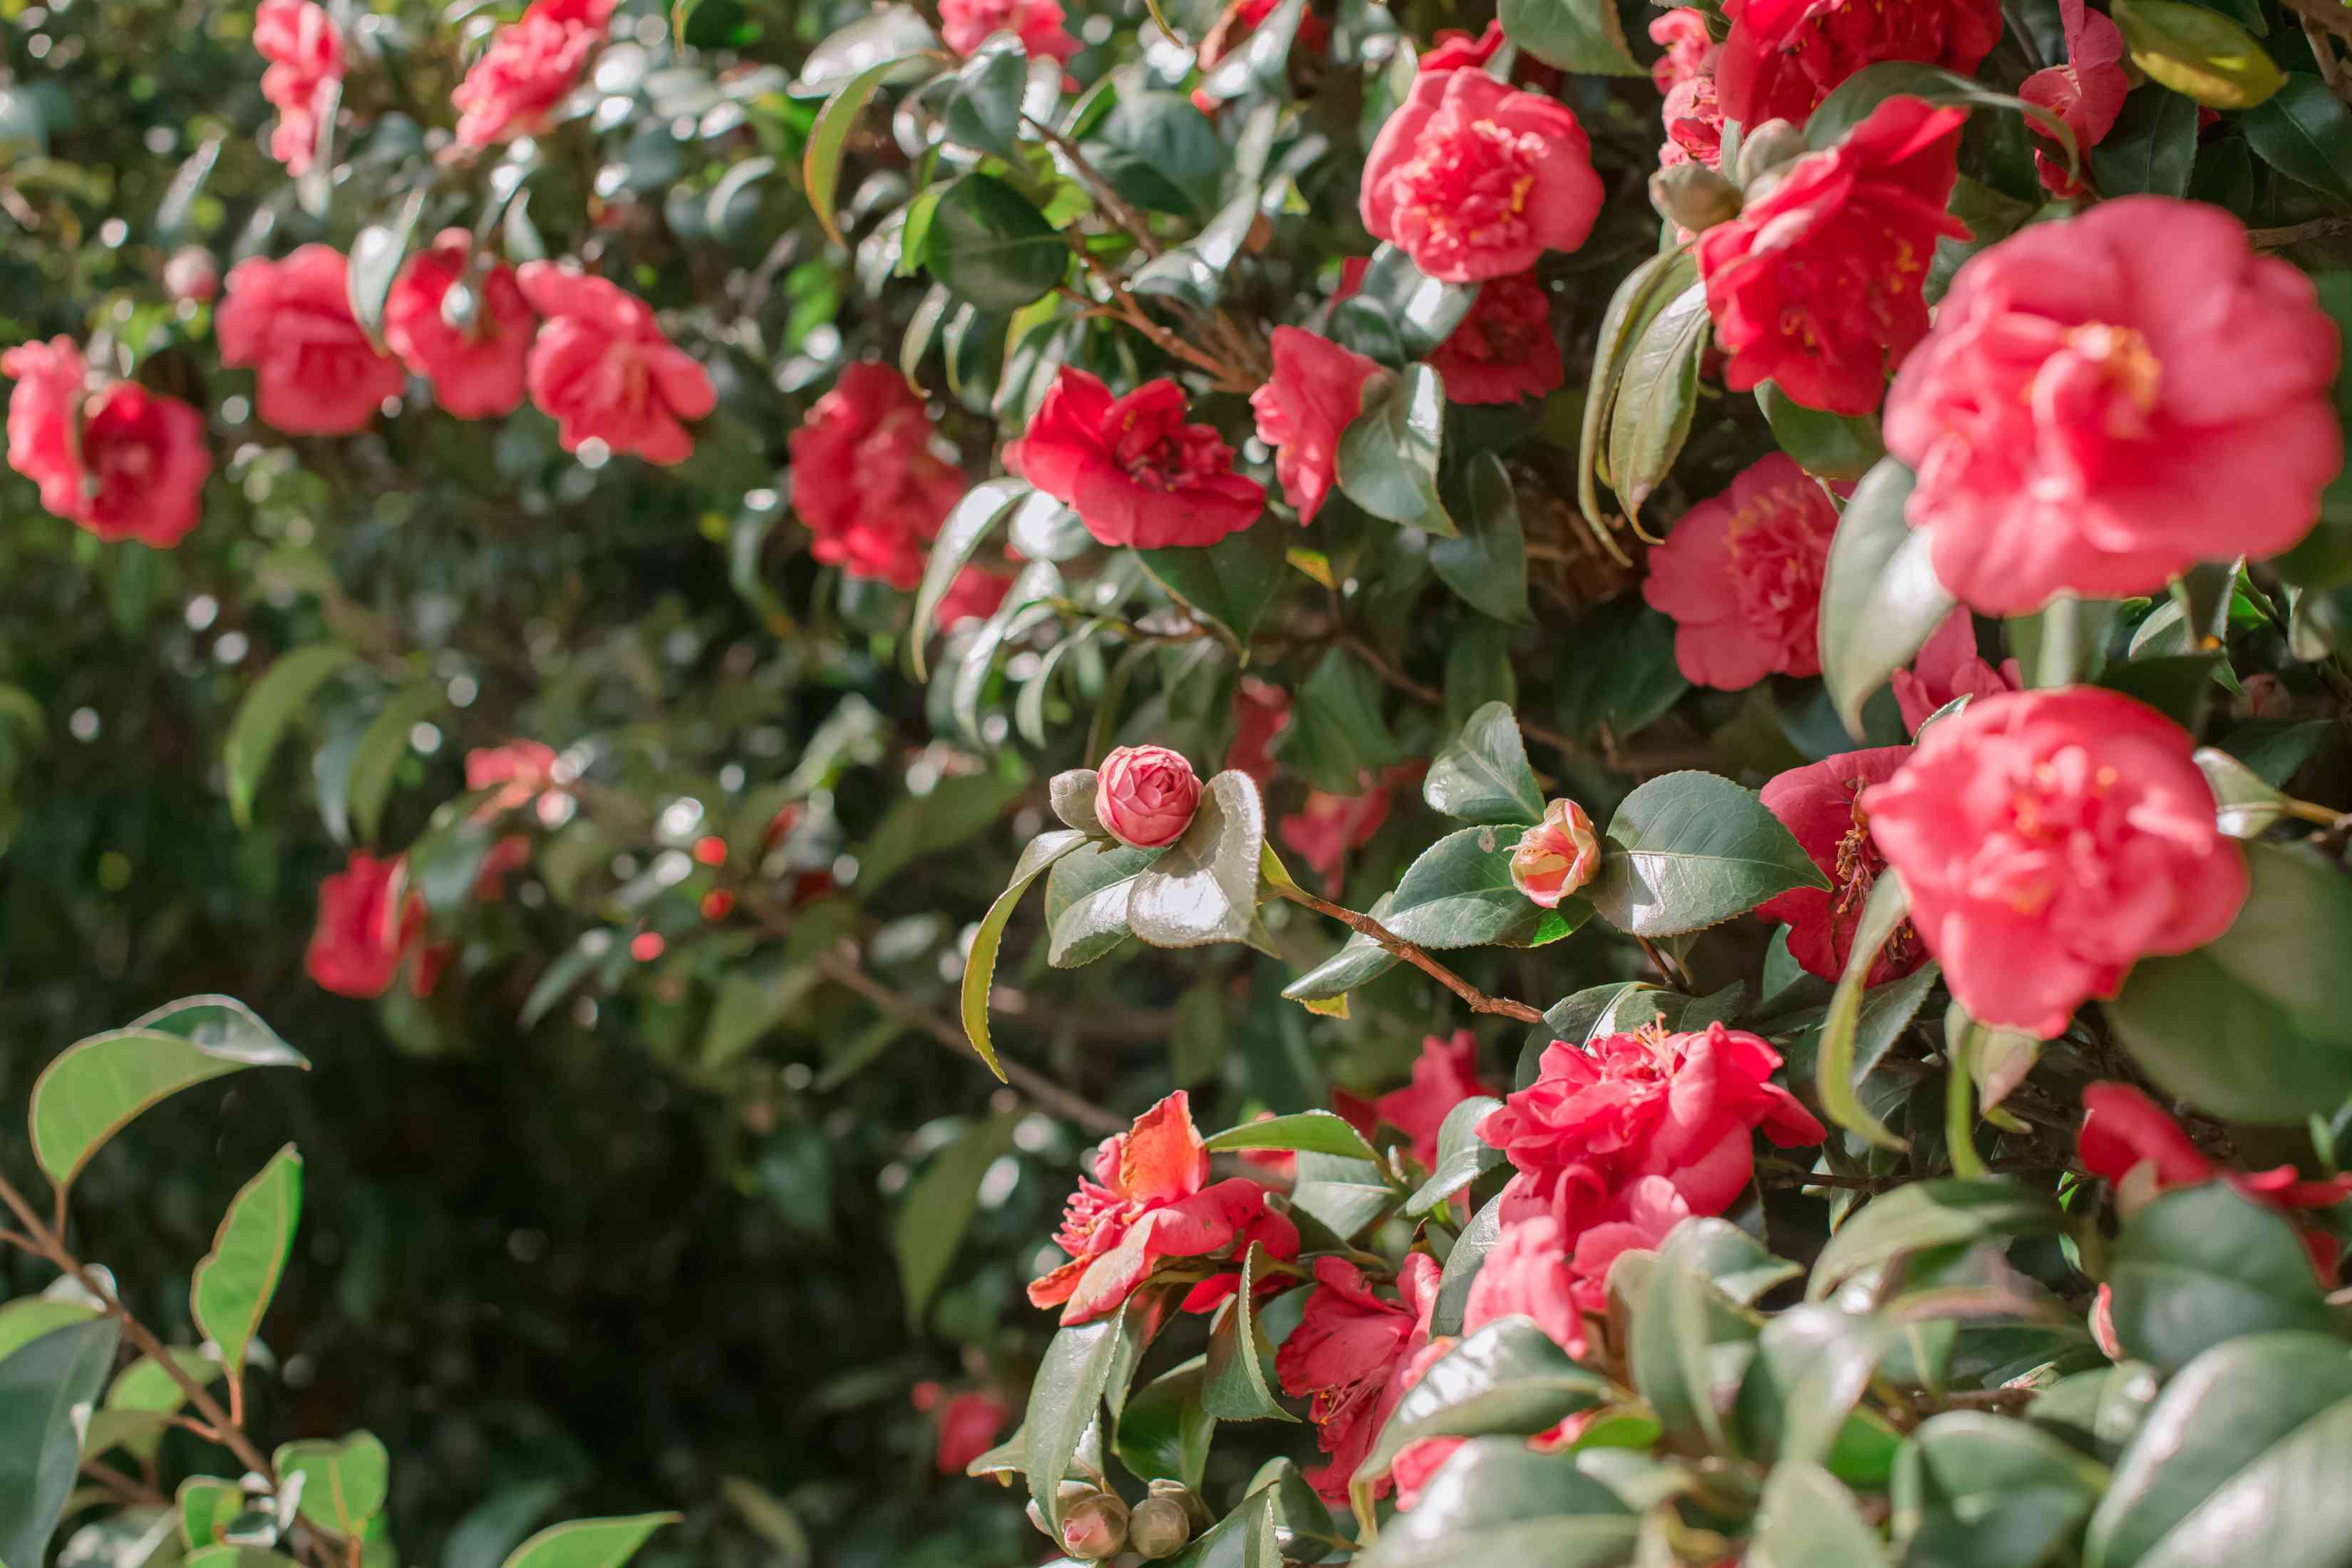 camellia shrub in bloom